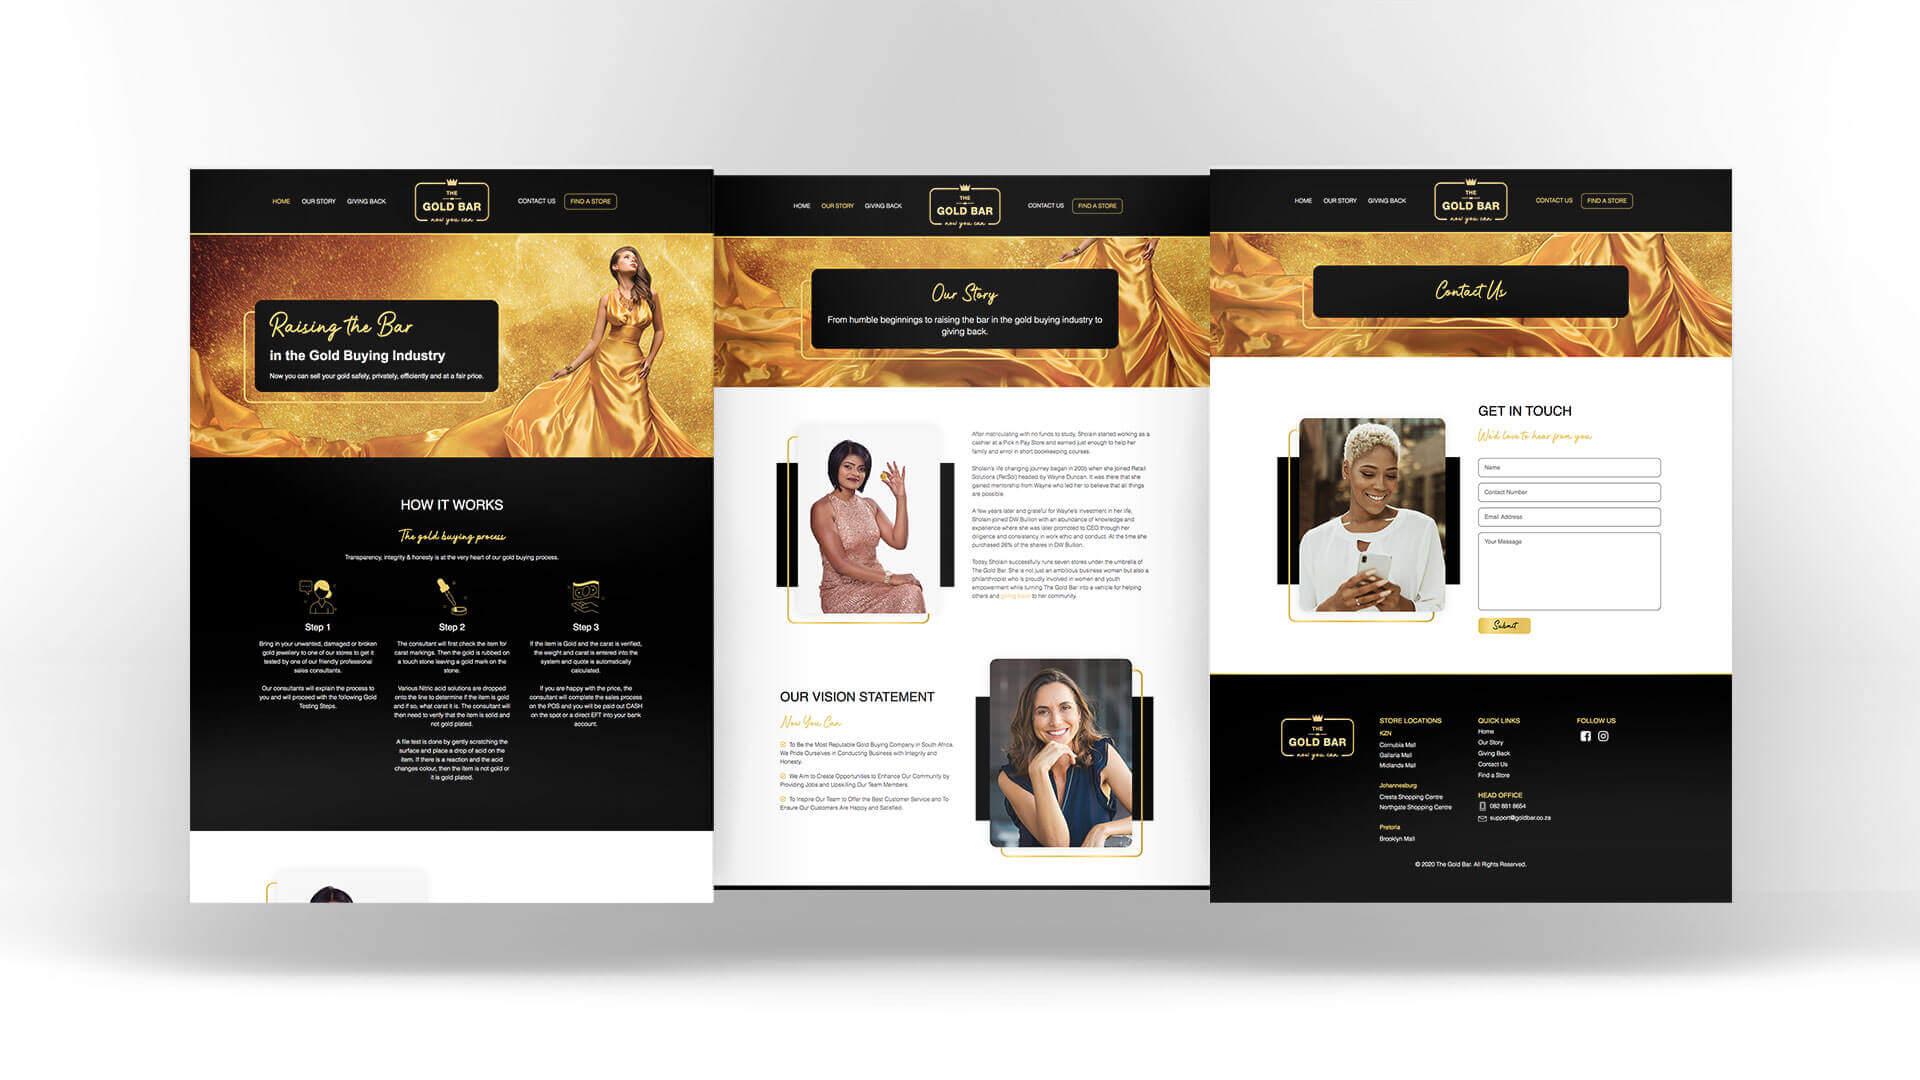 The Gold Bar Website Design